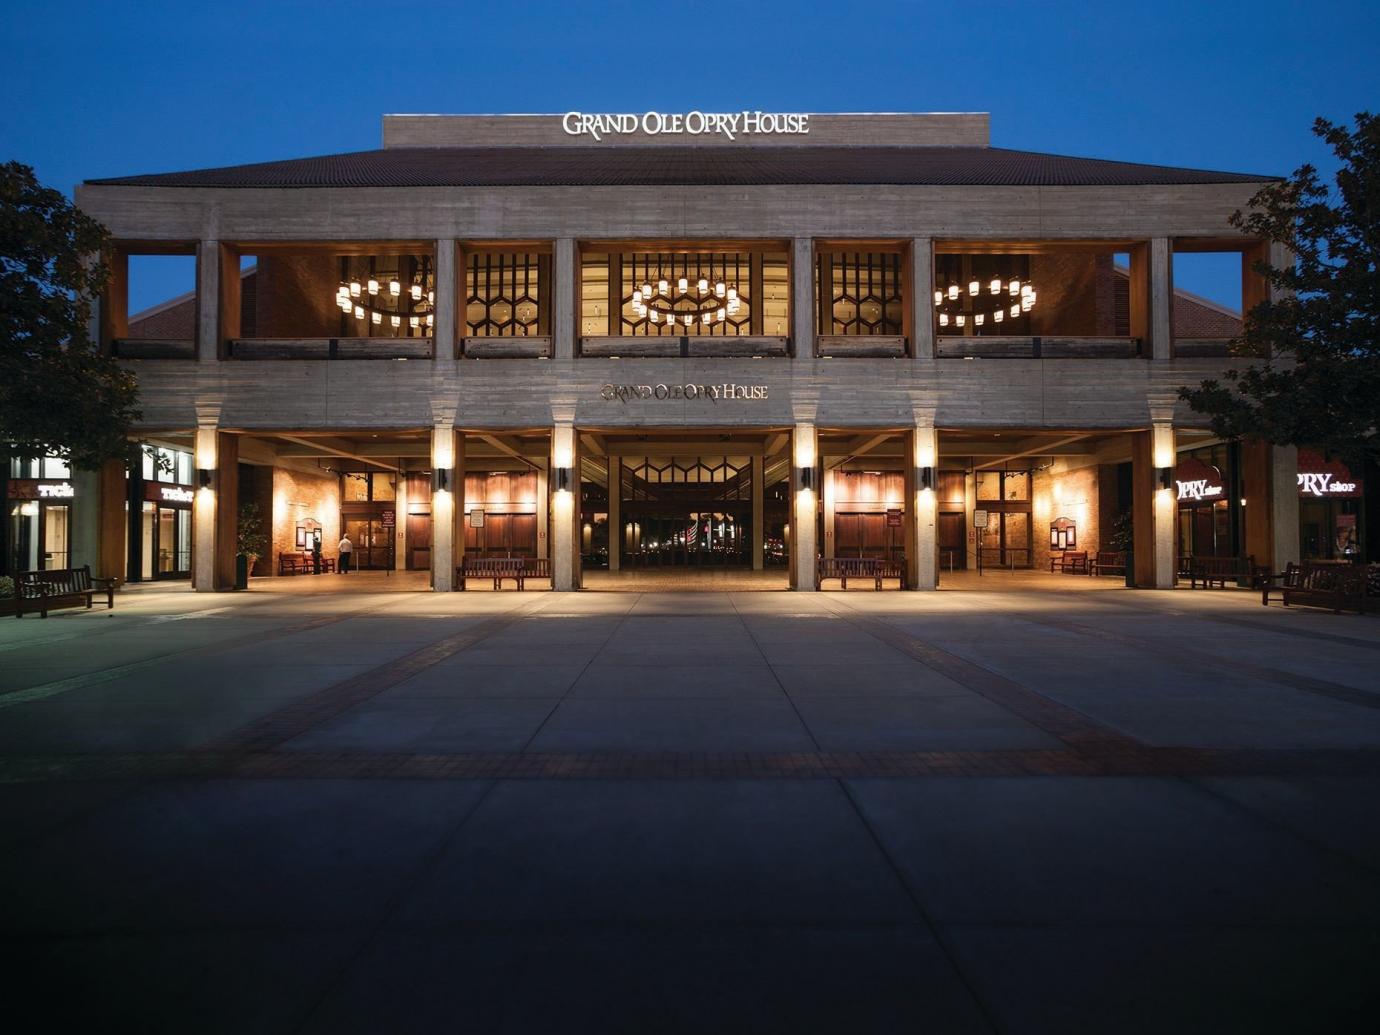 Grand Ole Opry at night